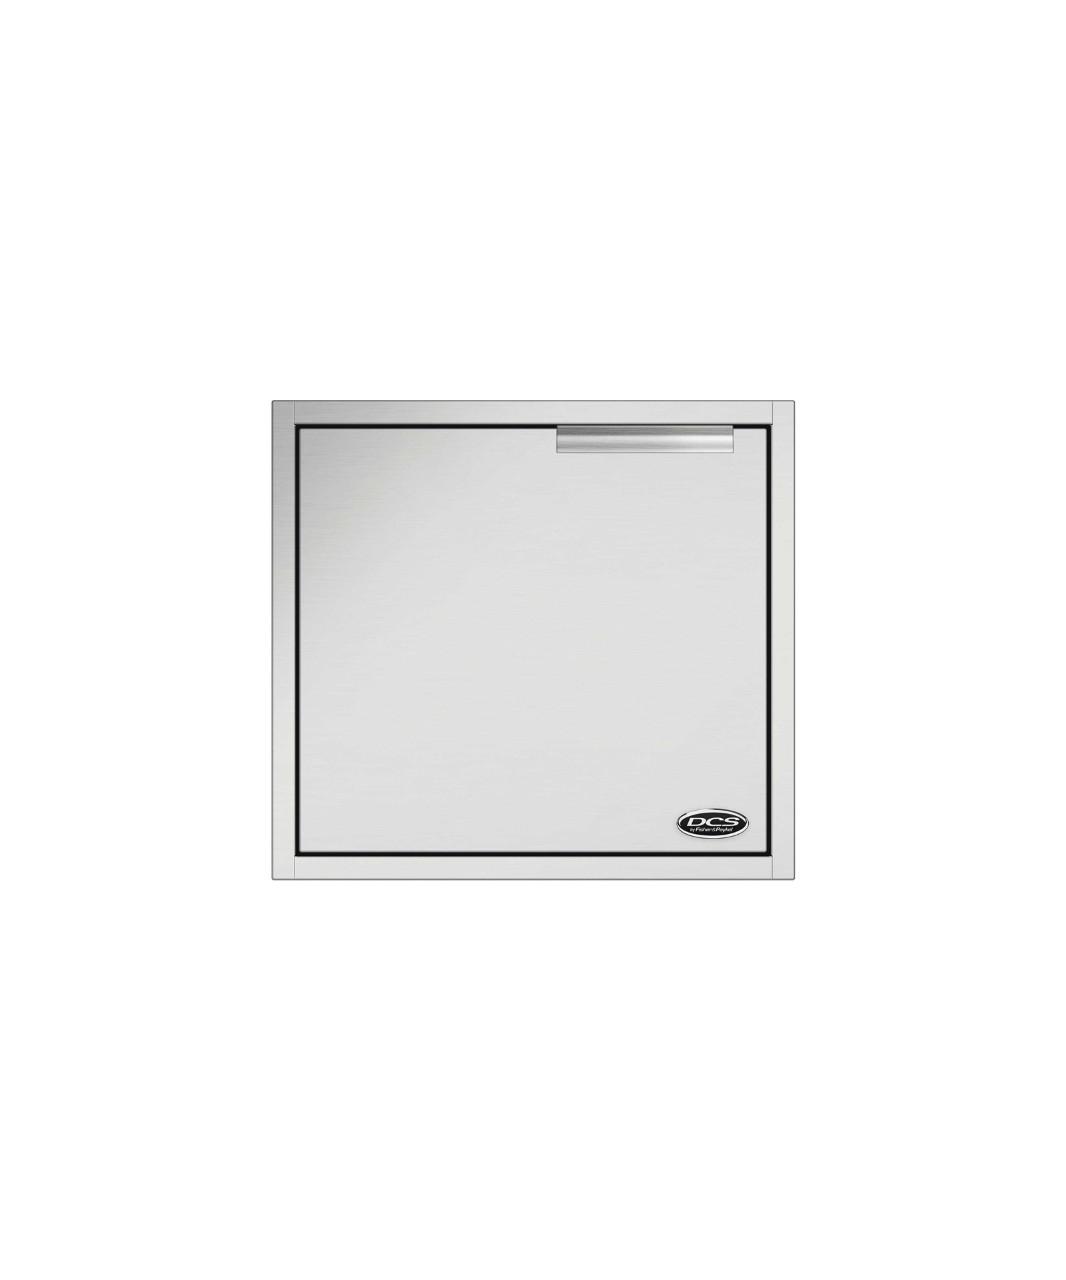 DCS Doors & Drawers Visual List Item Image